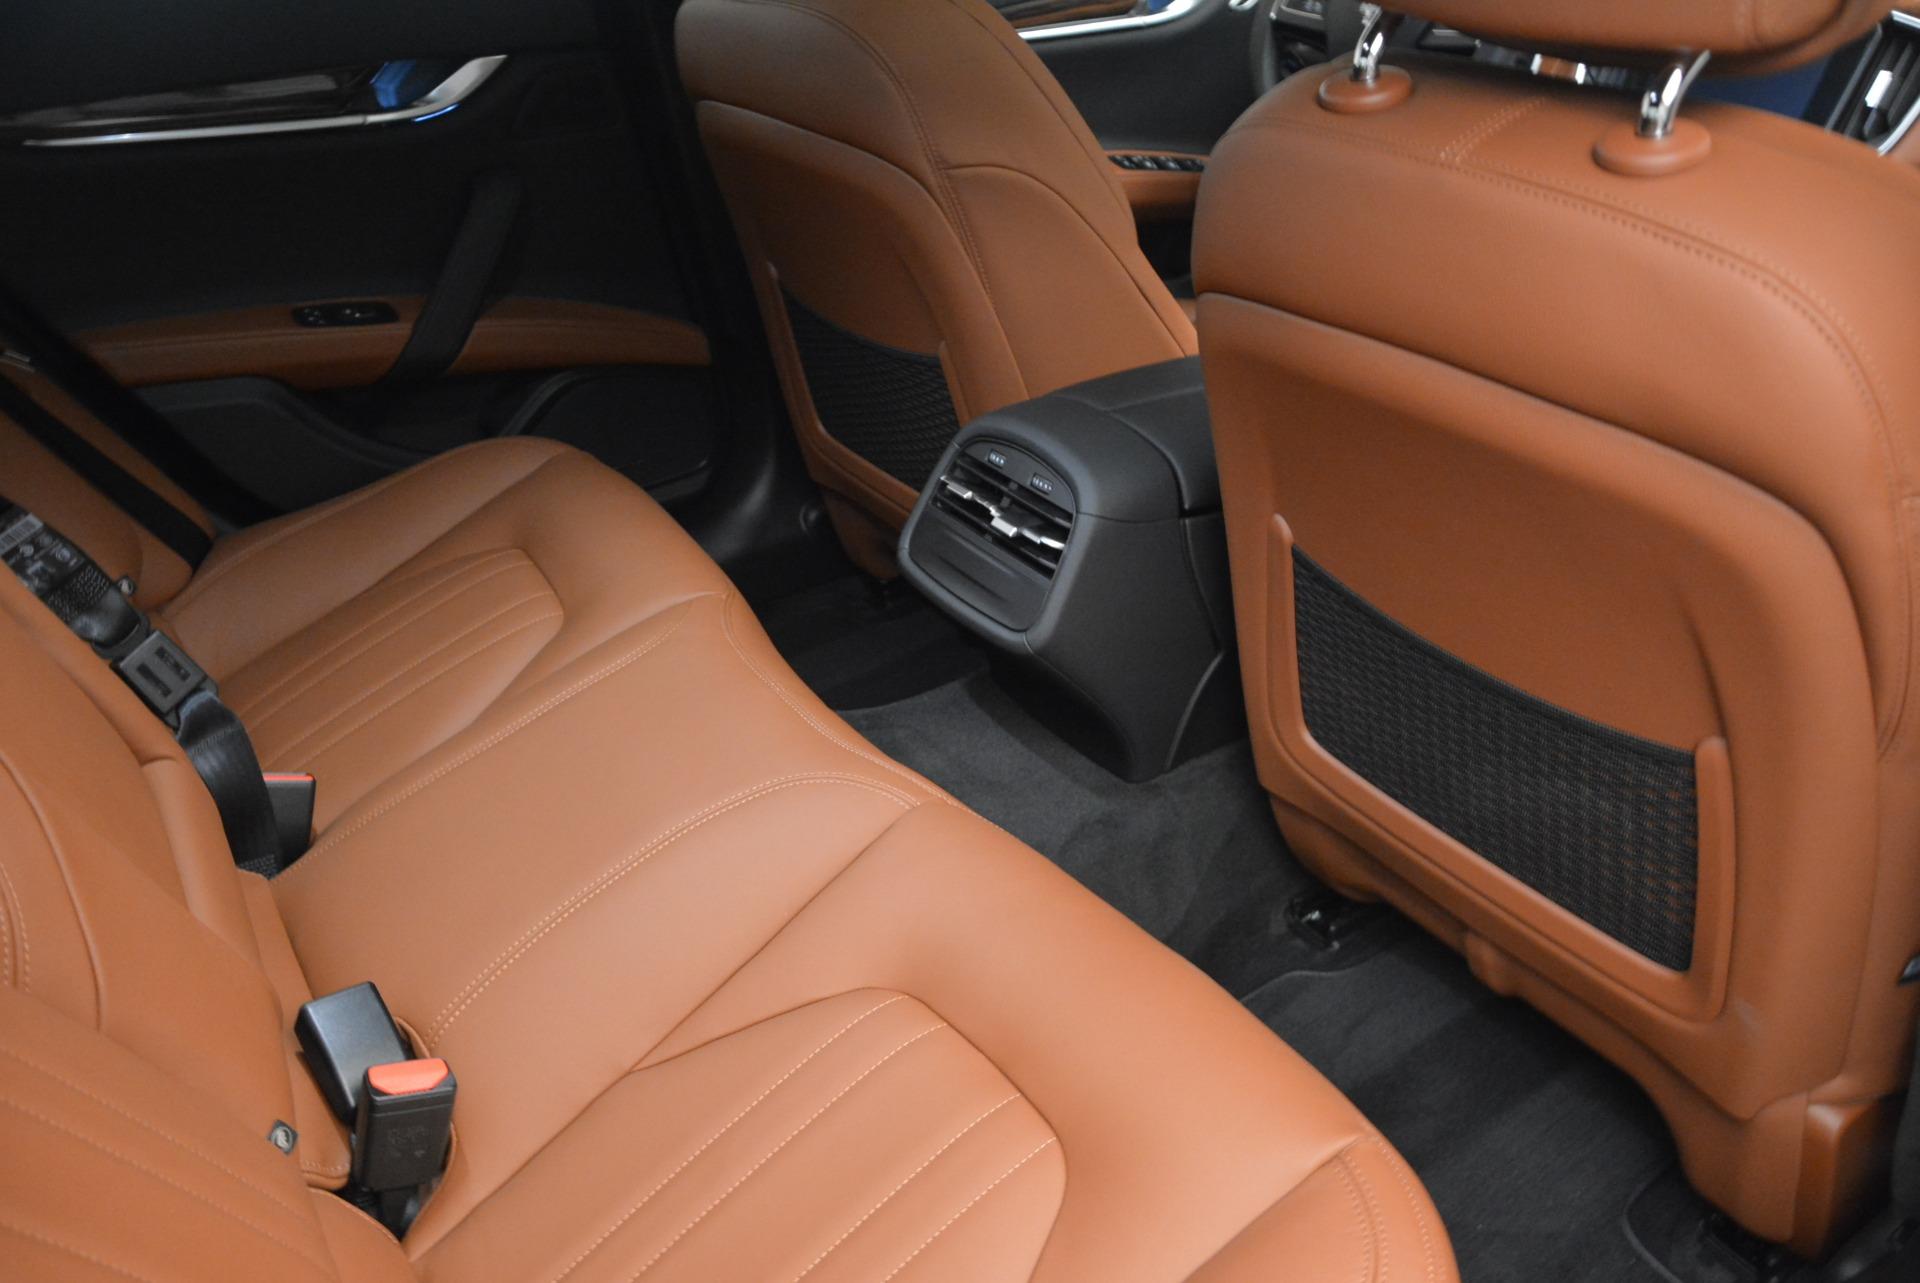 Used 2017 Maserati Ghibli S Q4 EX-LOANER For Sale In Westport, CT 608_p23